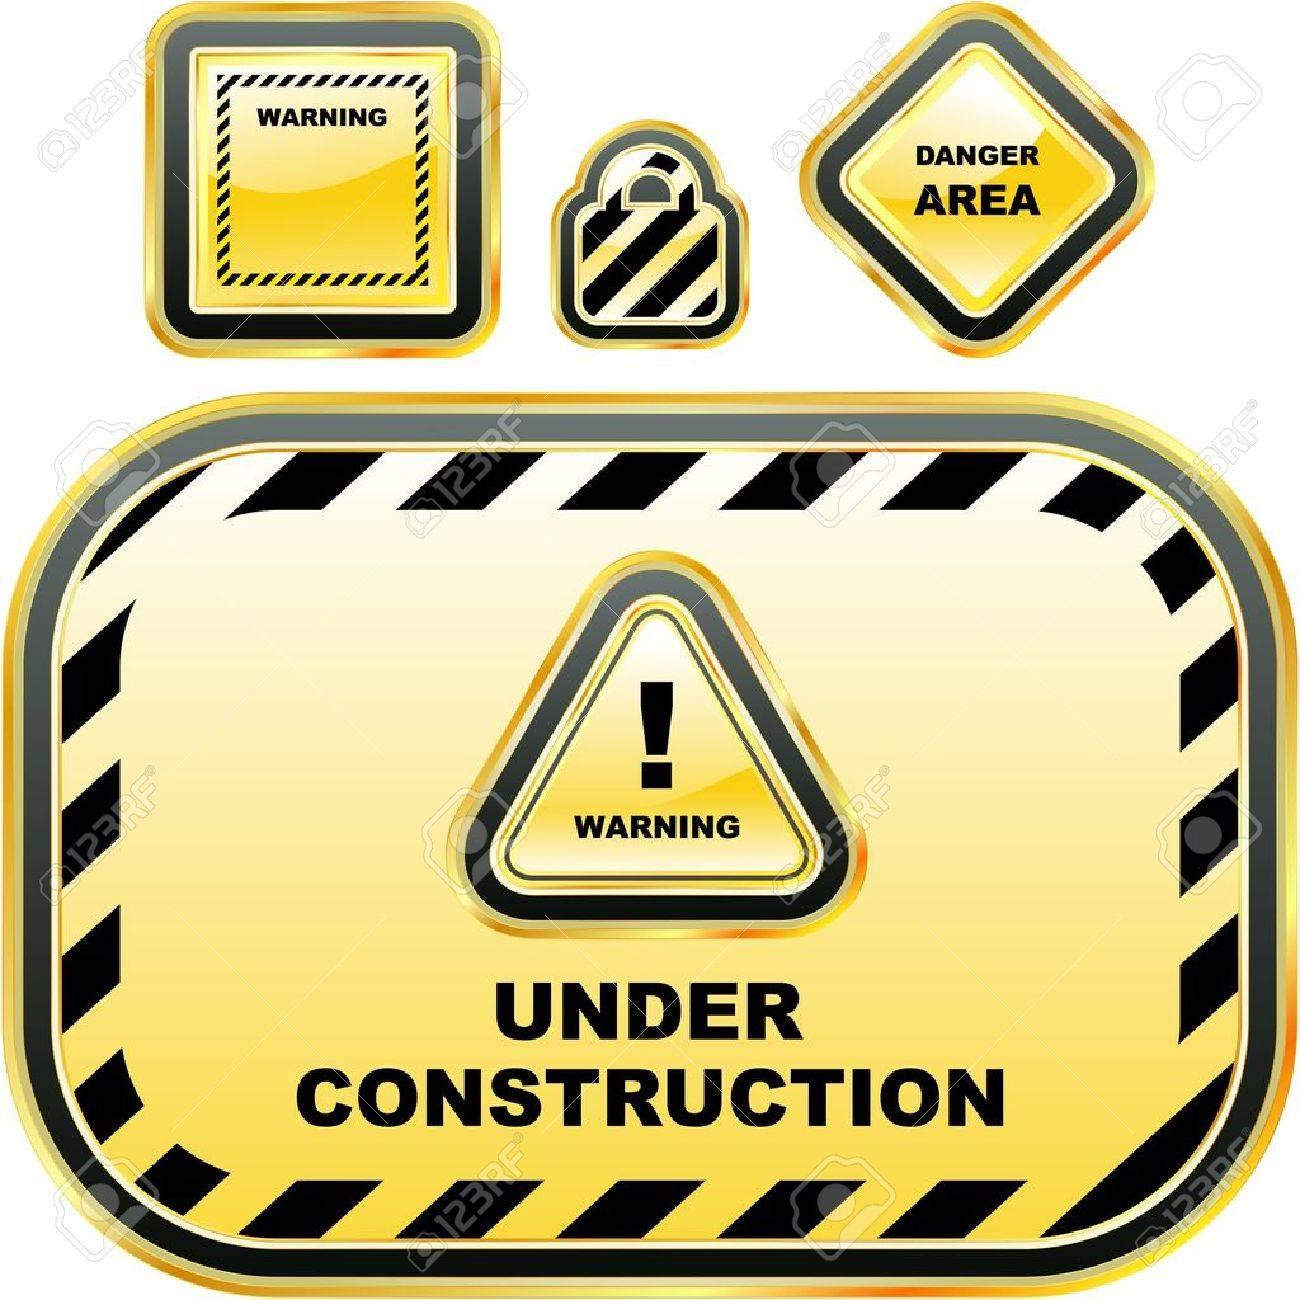 Warning label set. Stock Vector - 7819607